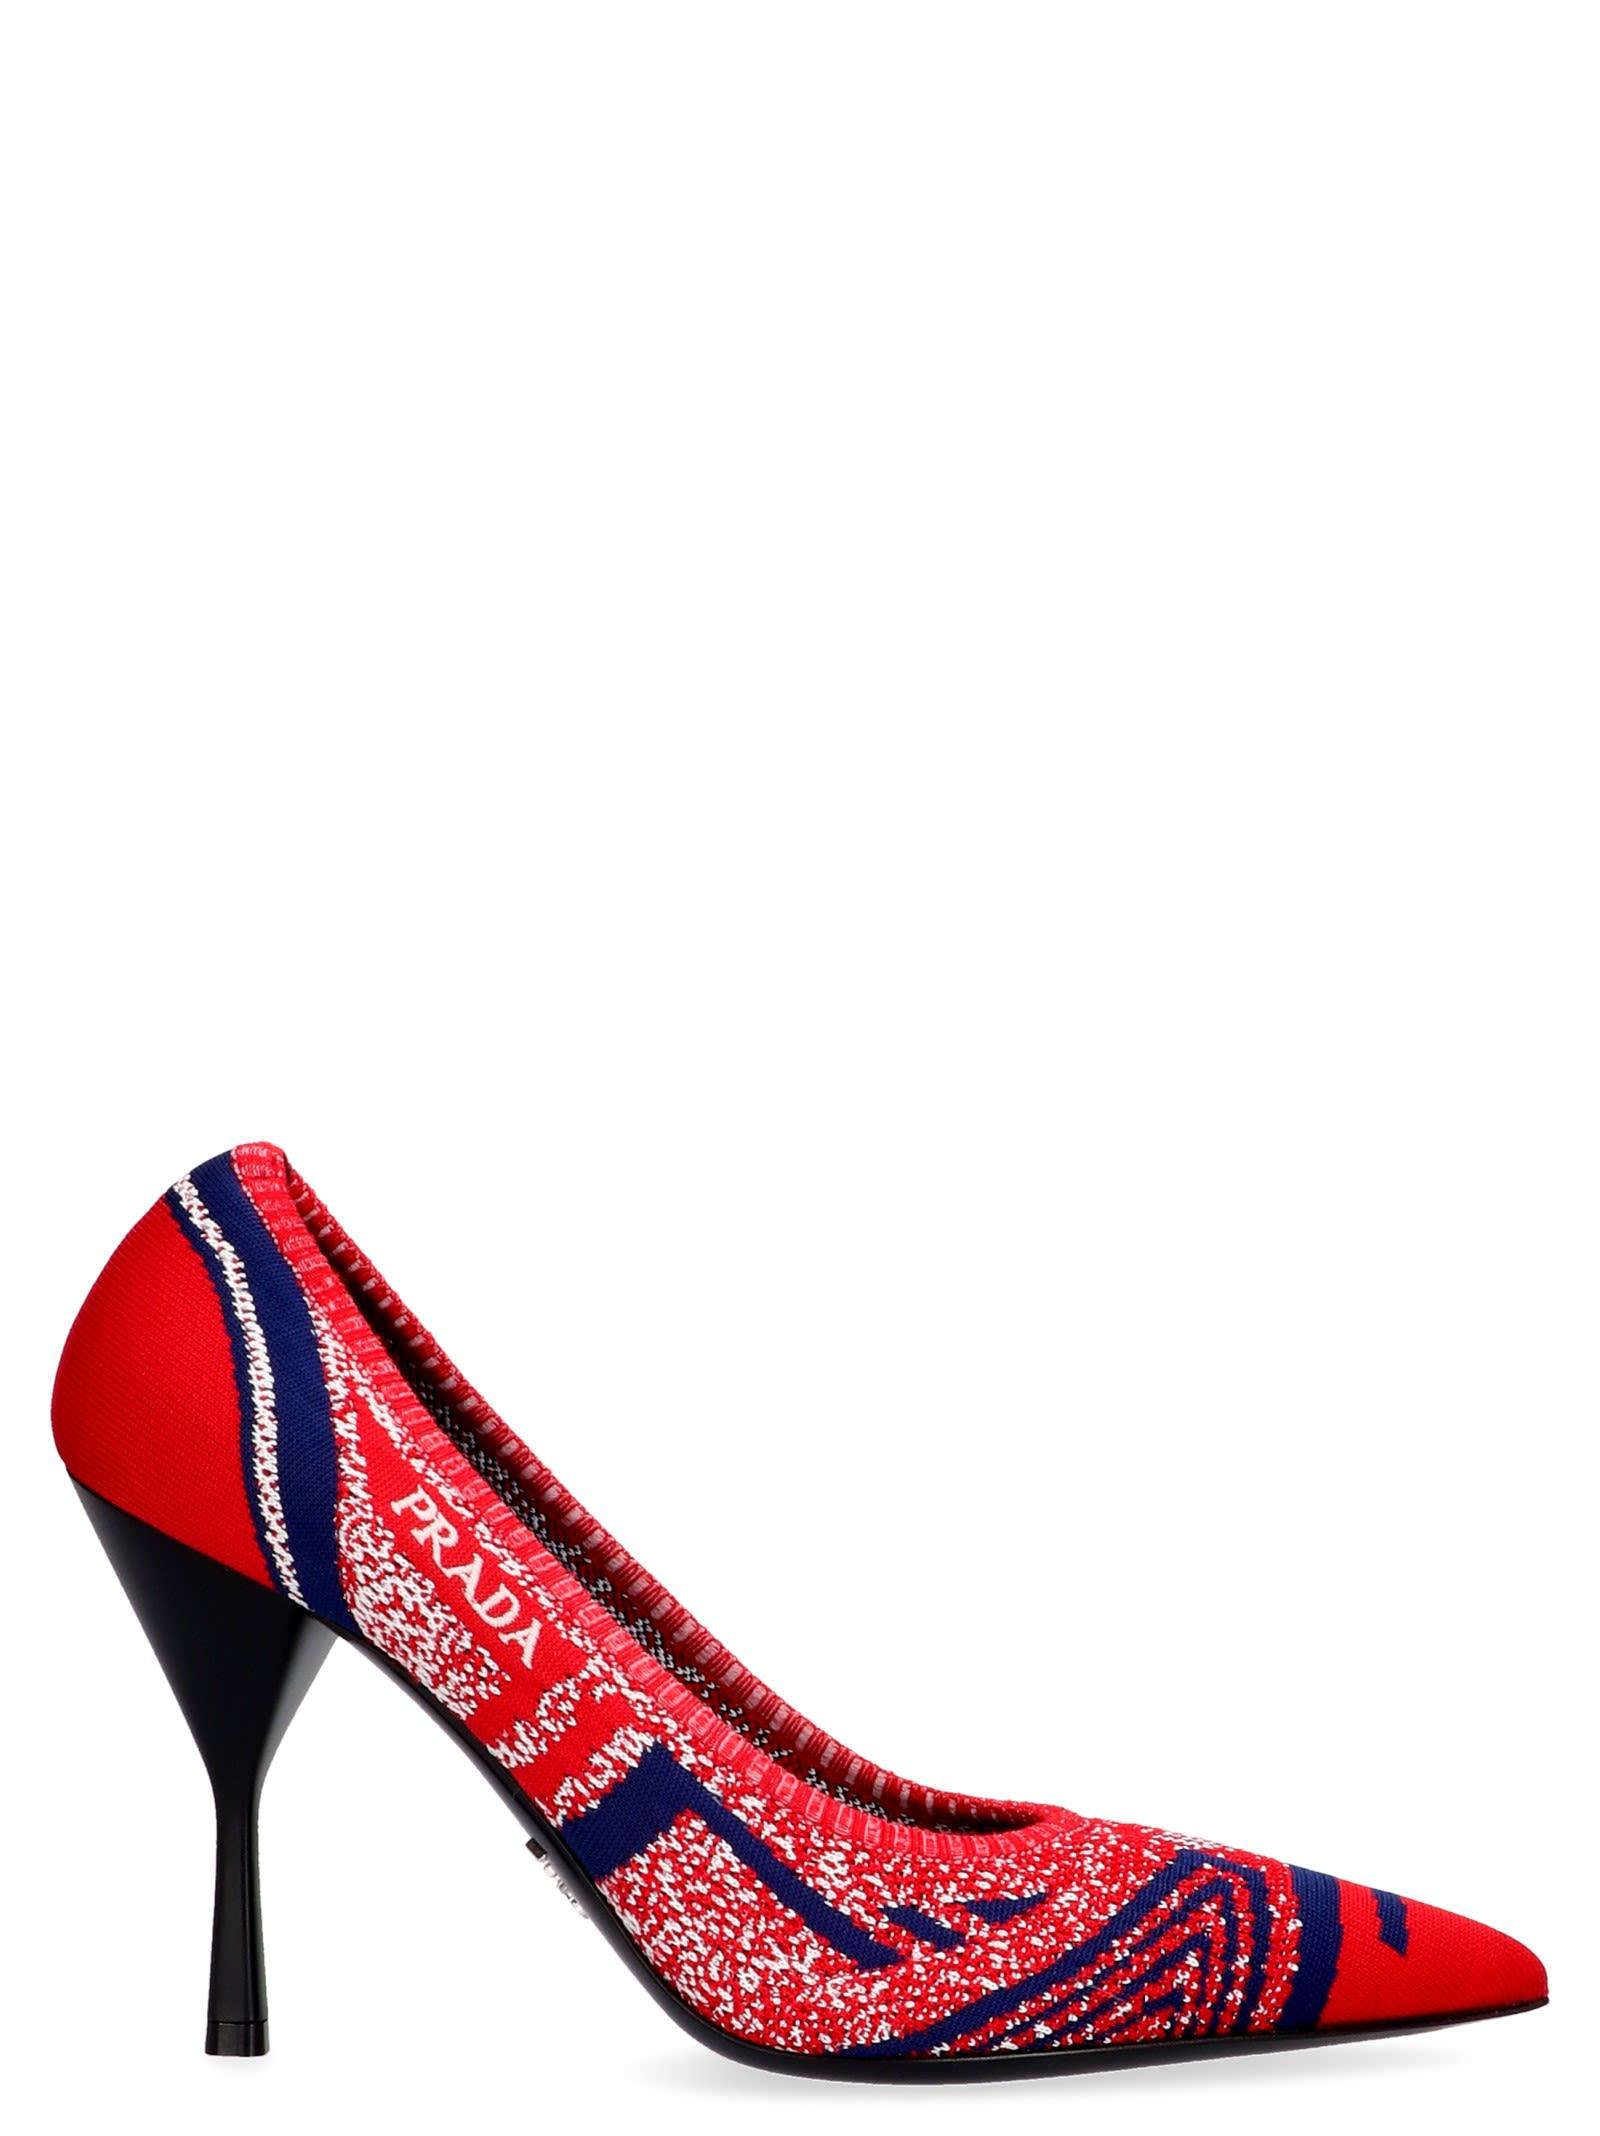 Prada 'Mouline Resort' Shoes in Red